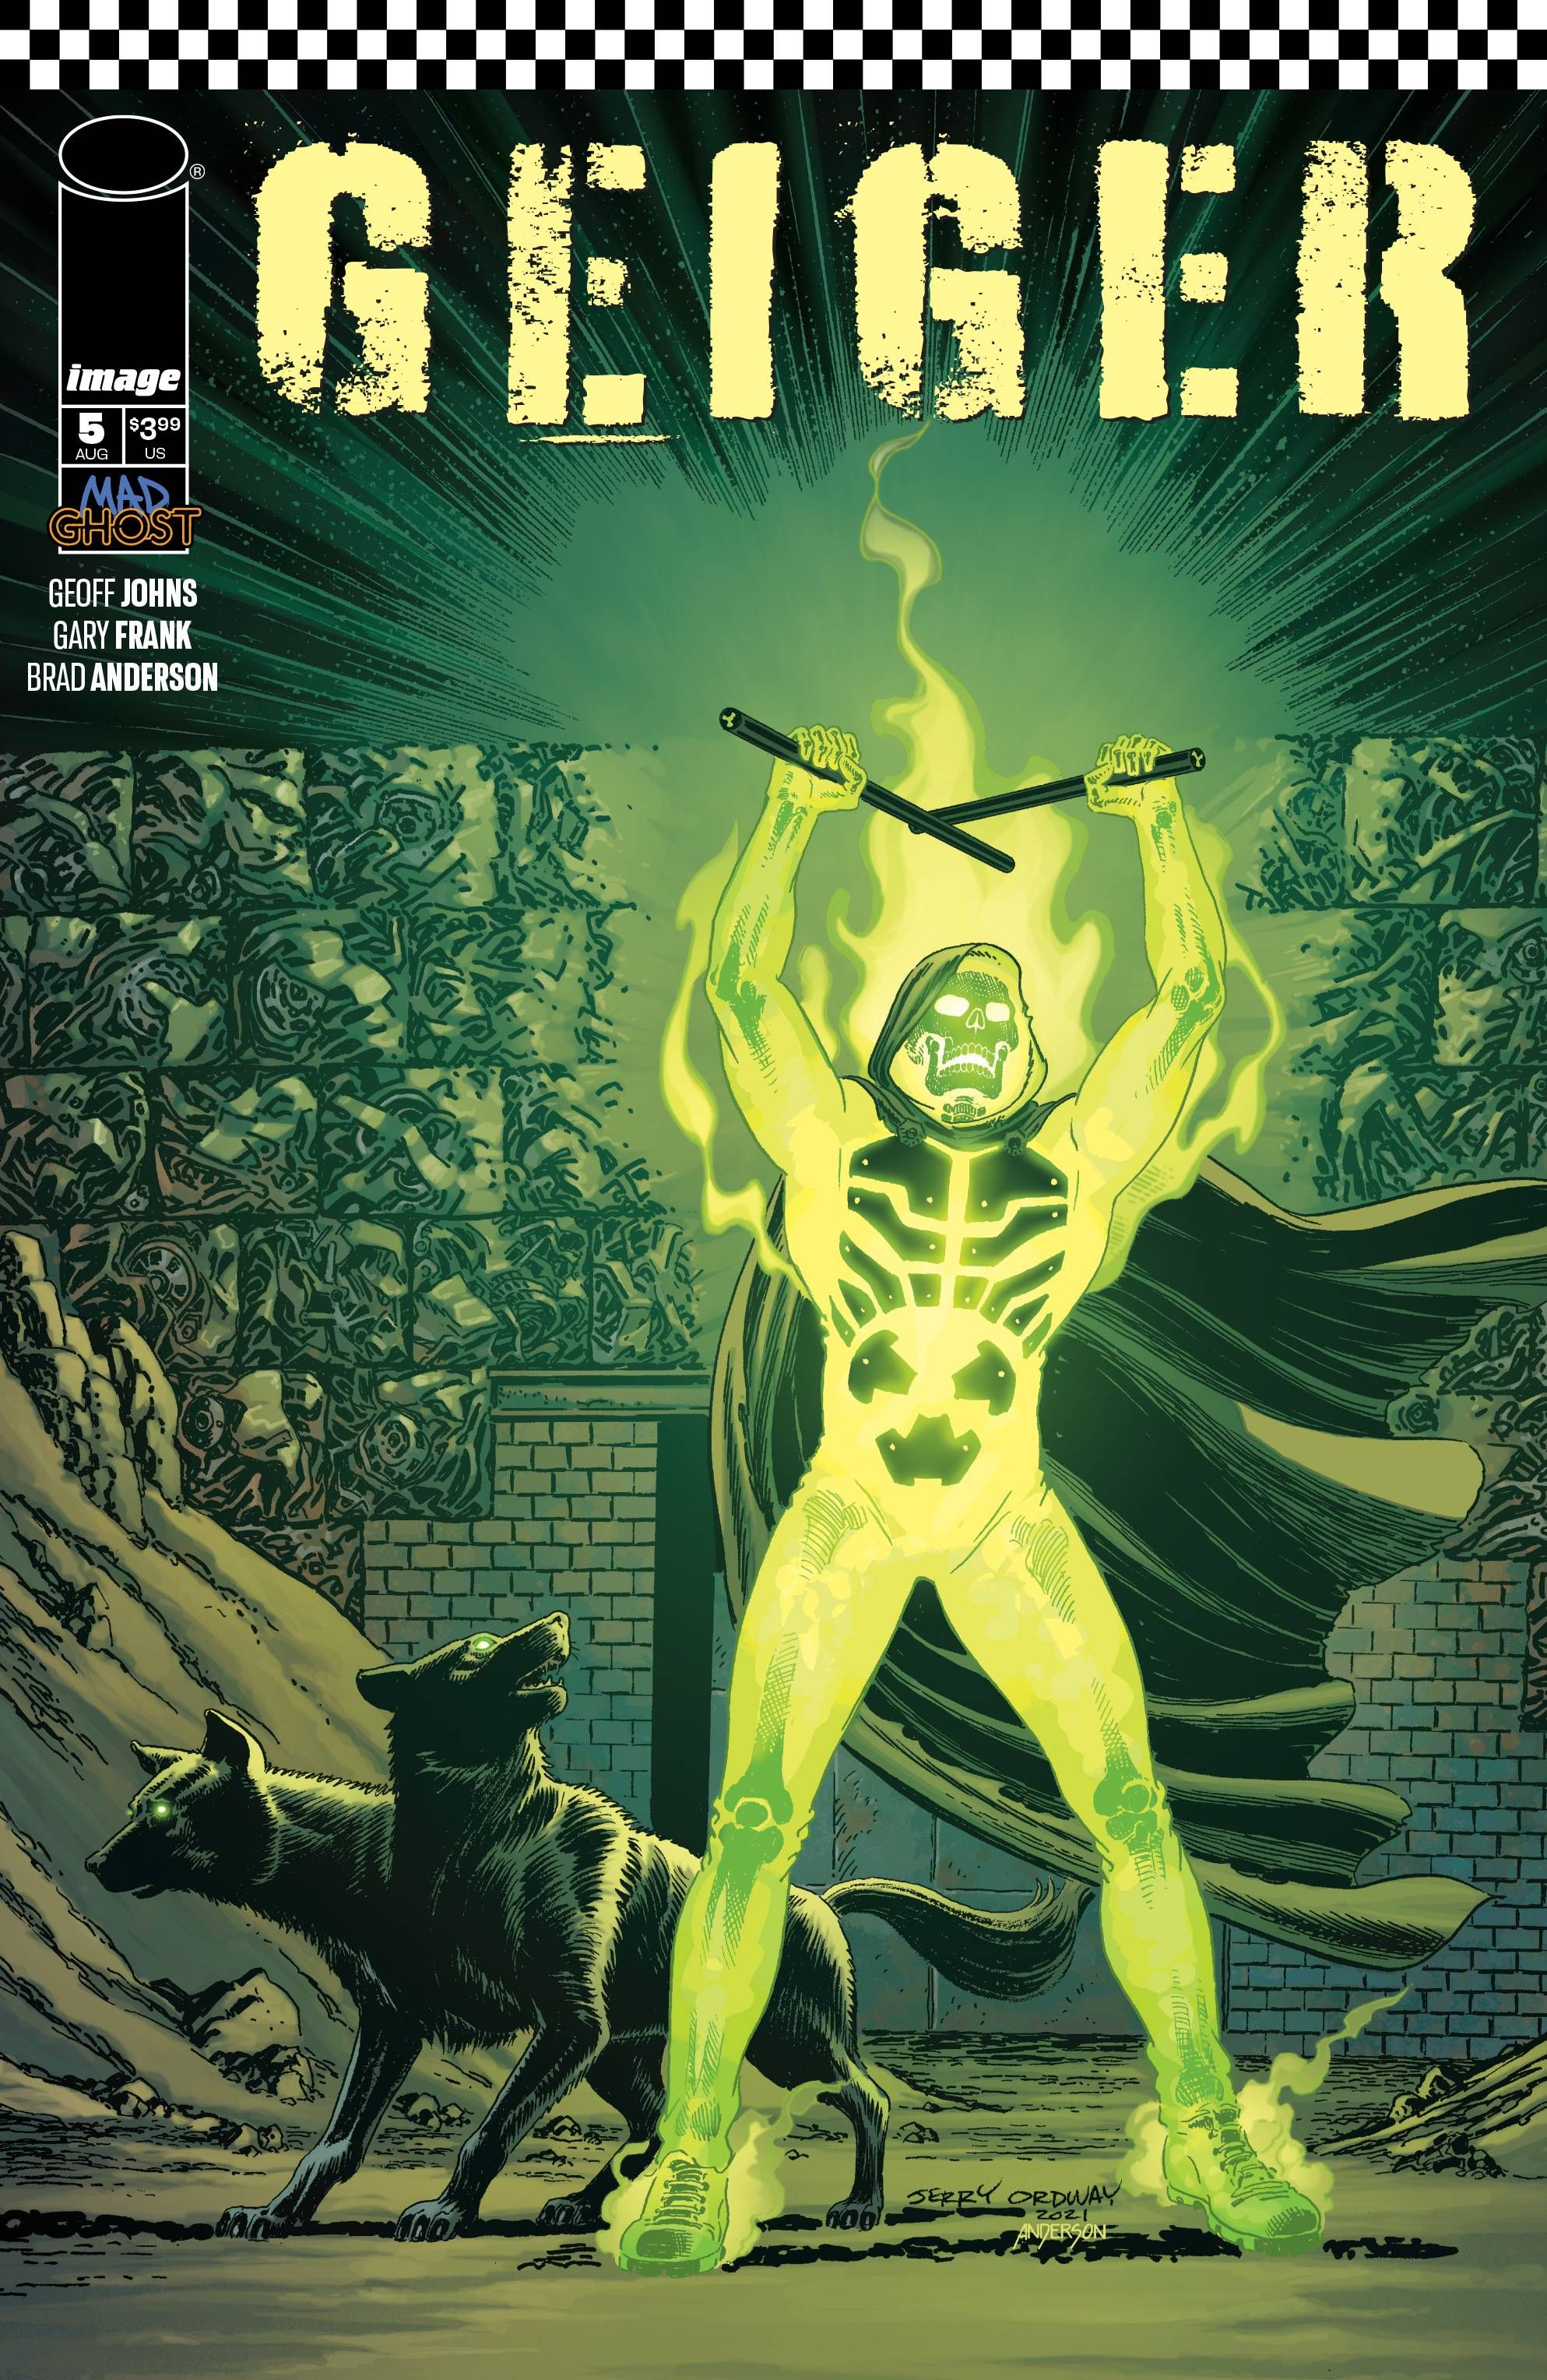 eyJidWNrZXQiOiJnb2NvbGxlY3QuaW1hZ2VzLnB1YiIsImtleSI6IjkwOWNlOTBjLWRkNmMtNGVlZS05Yzk0LWJkYjlhODgyOTU1Ni5qcGciLCJlZGl0cyI6W119 ComicList: Image Comics New Releases for 08/04/2021